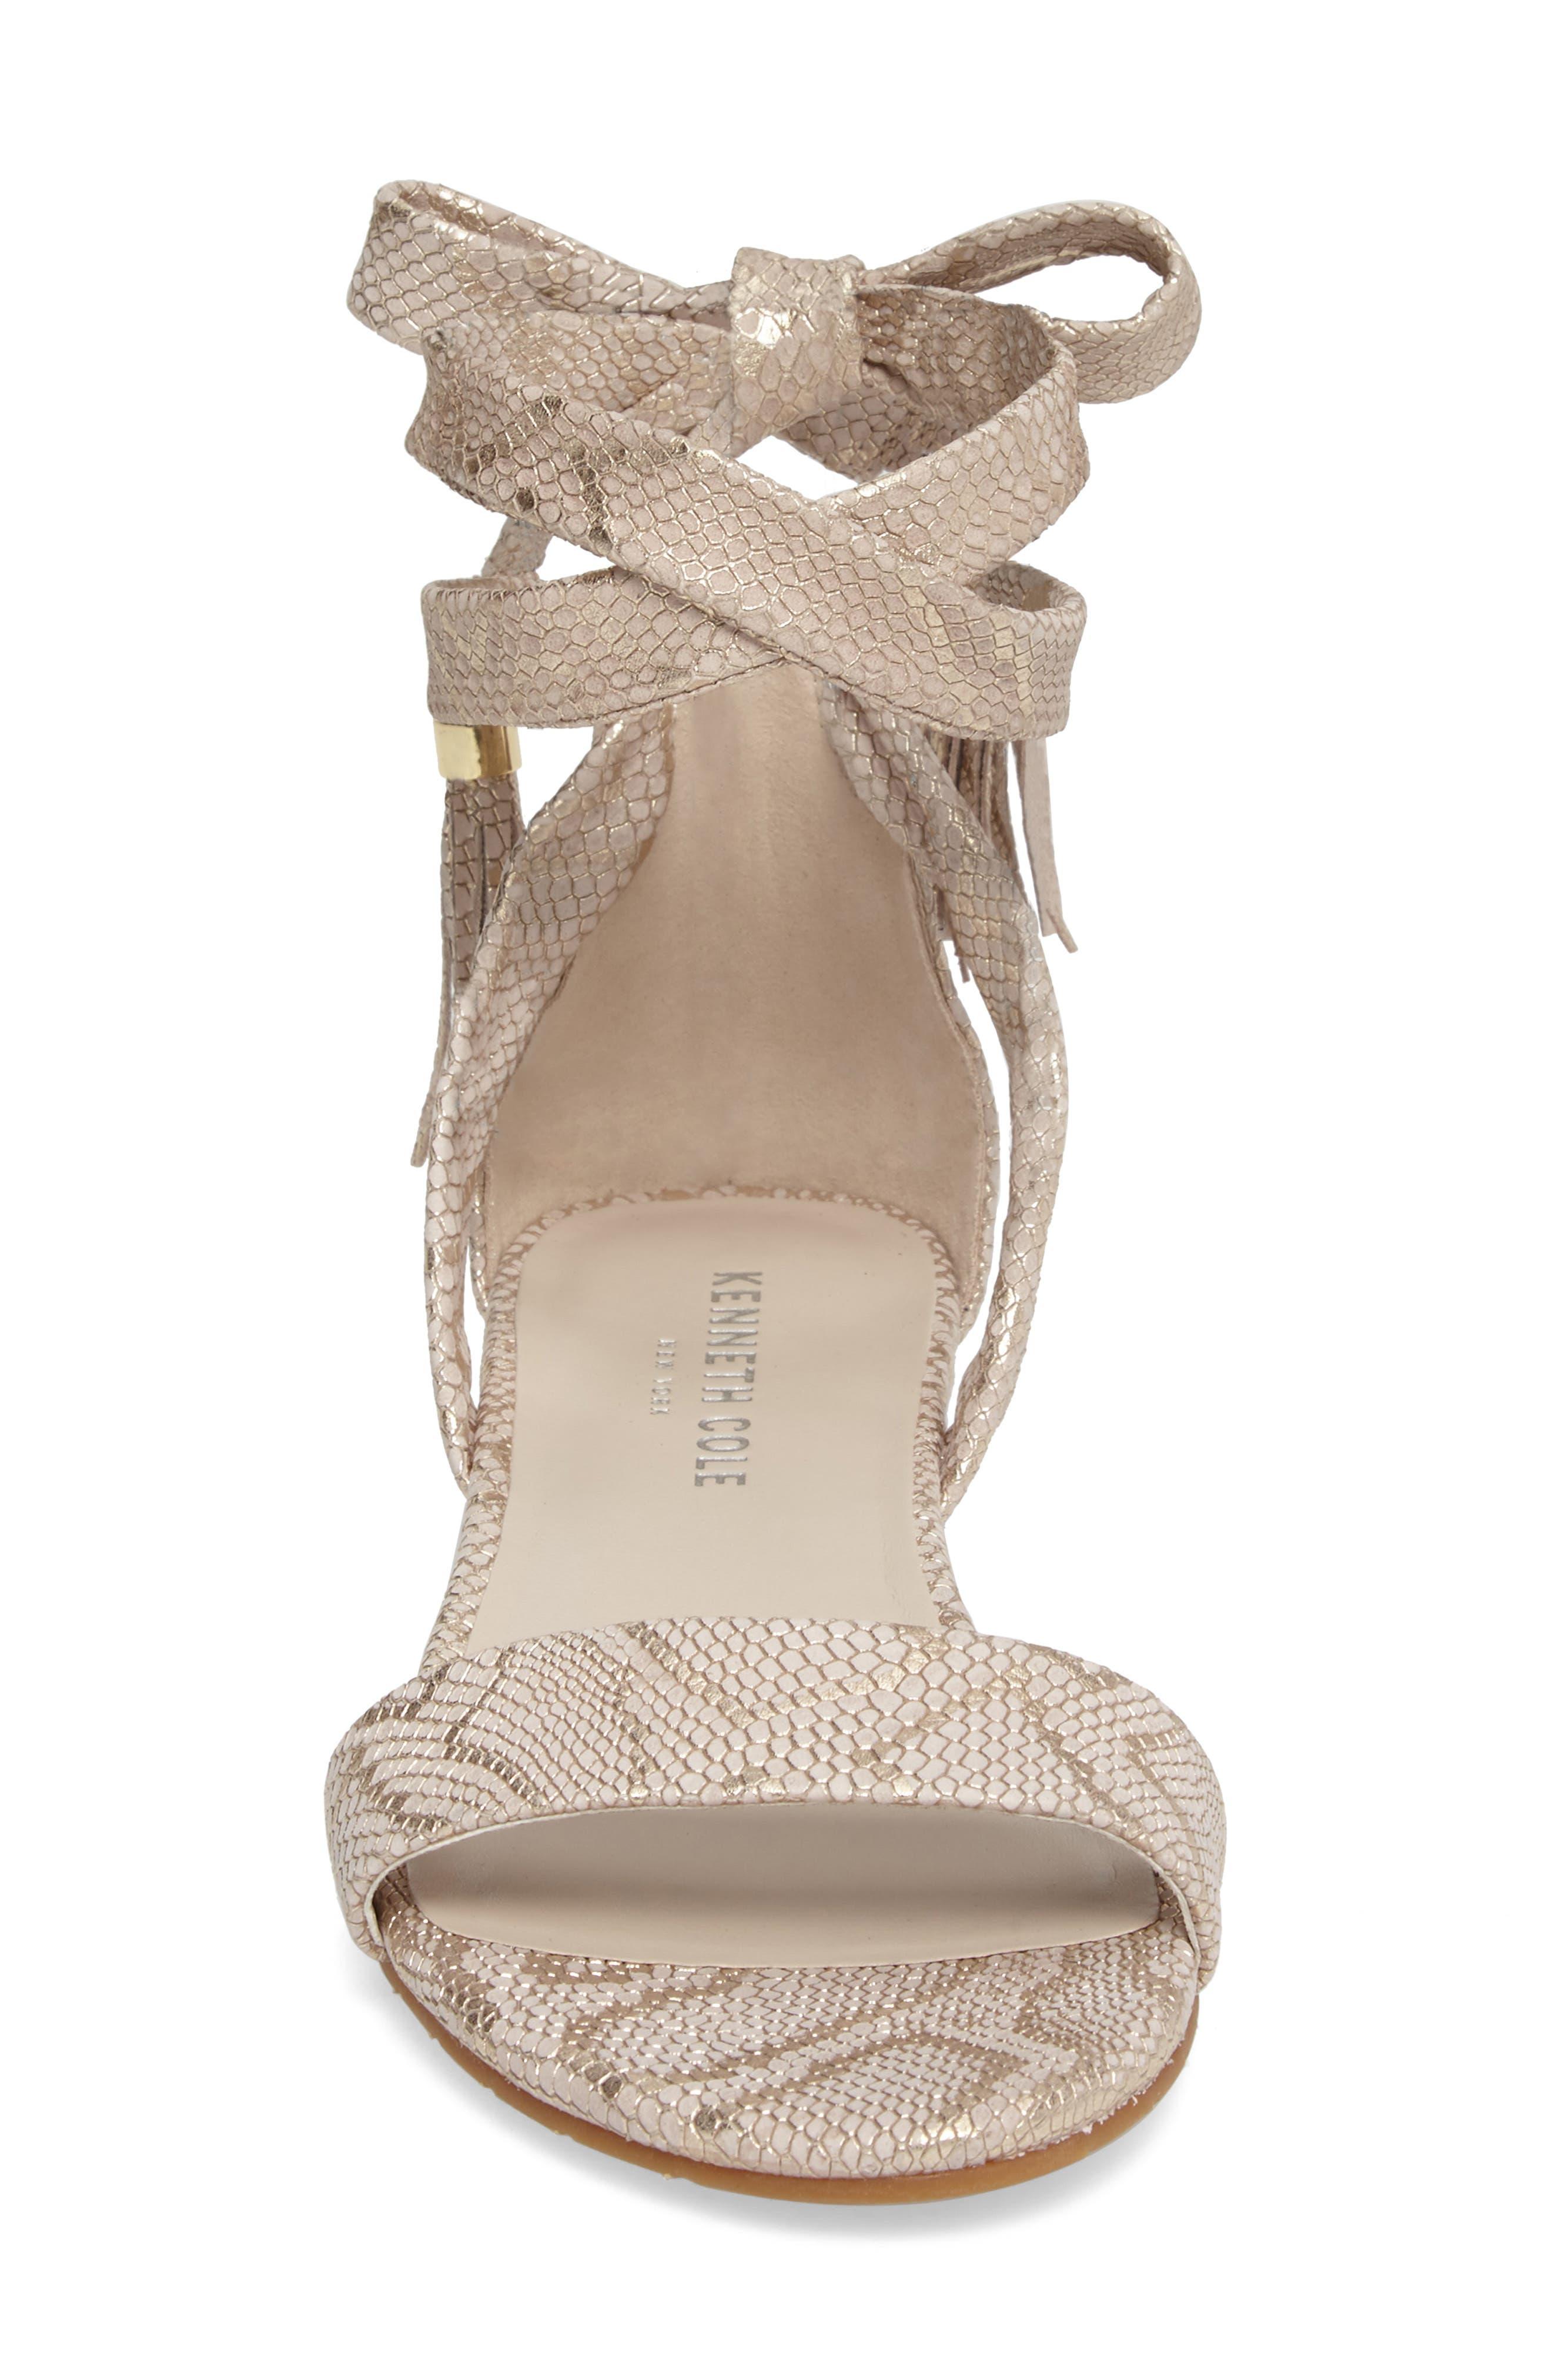 Valen Tassel Lace-Up Sandal,                             Alternate thumbnail 46, color,